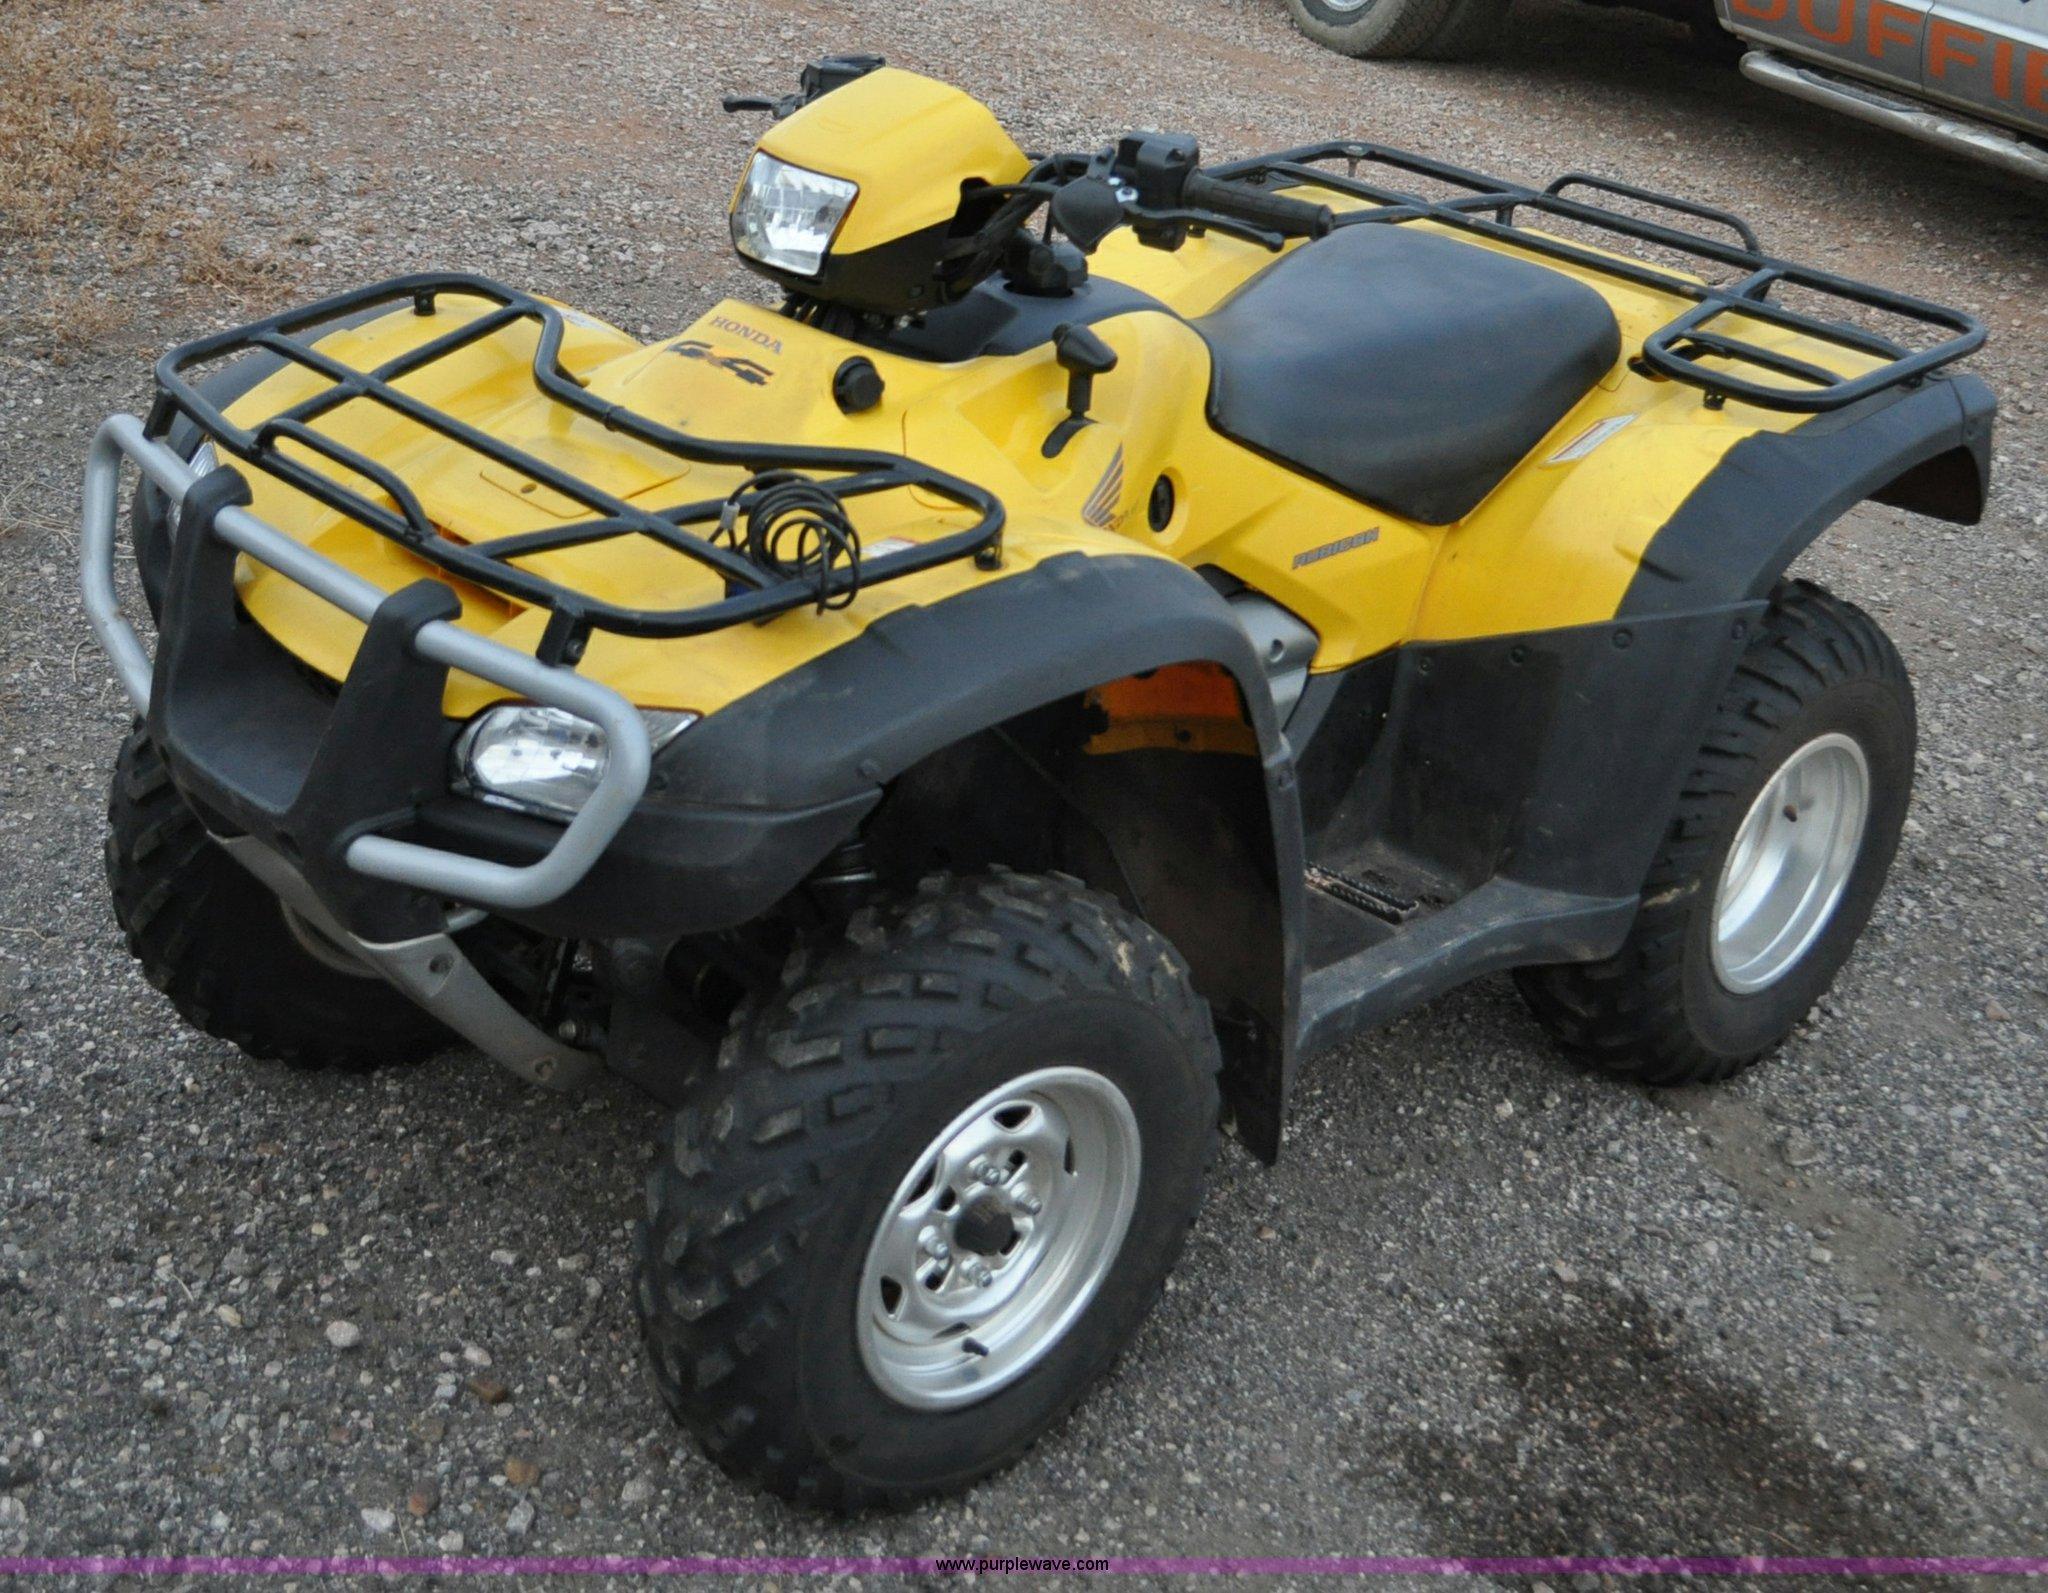 2005 Honda Rubicon ATV | Item C3234 | SOLD! December 6 Duffi